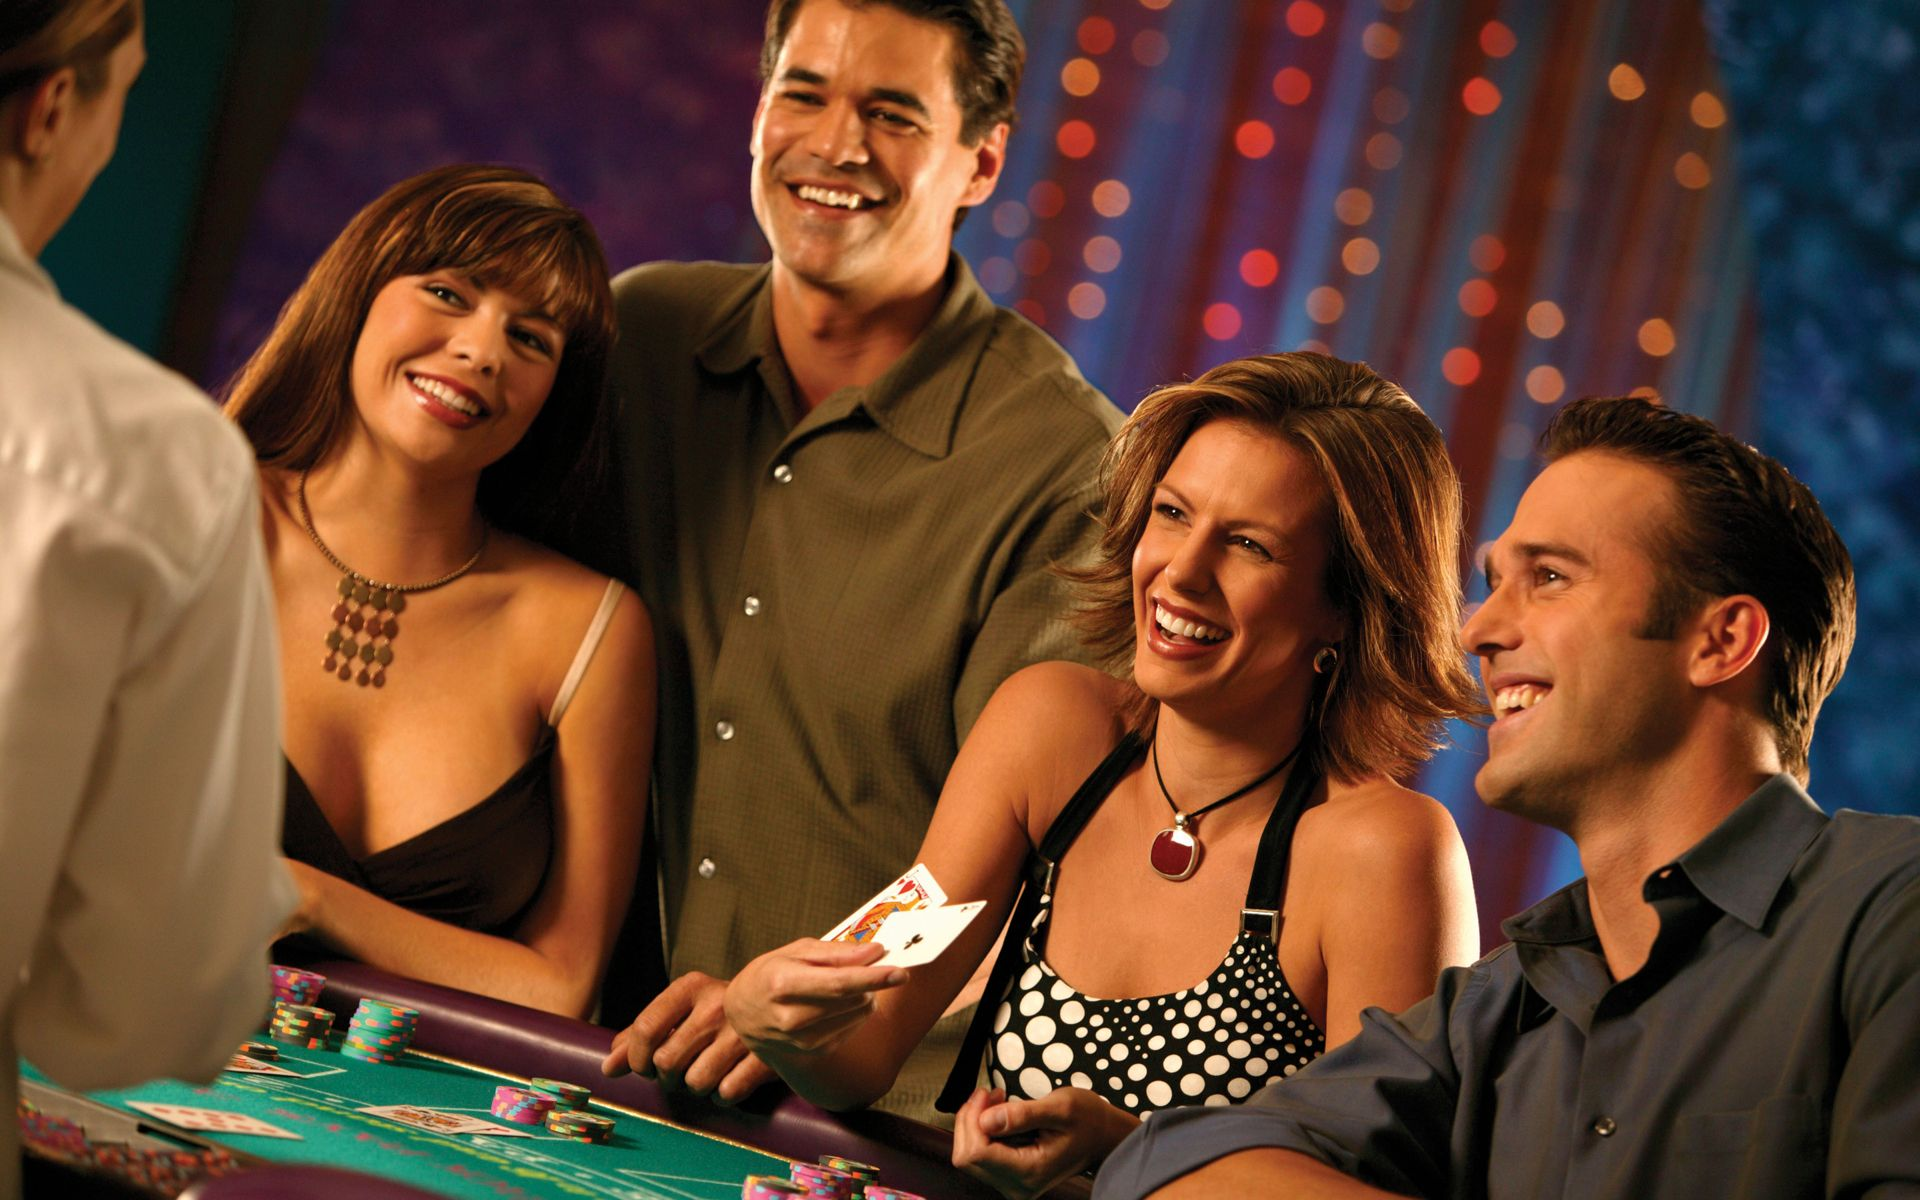 imagescasino-blackjack-12.jpg